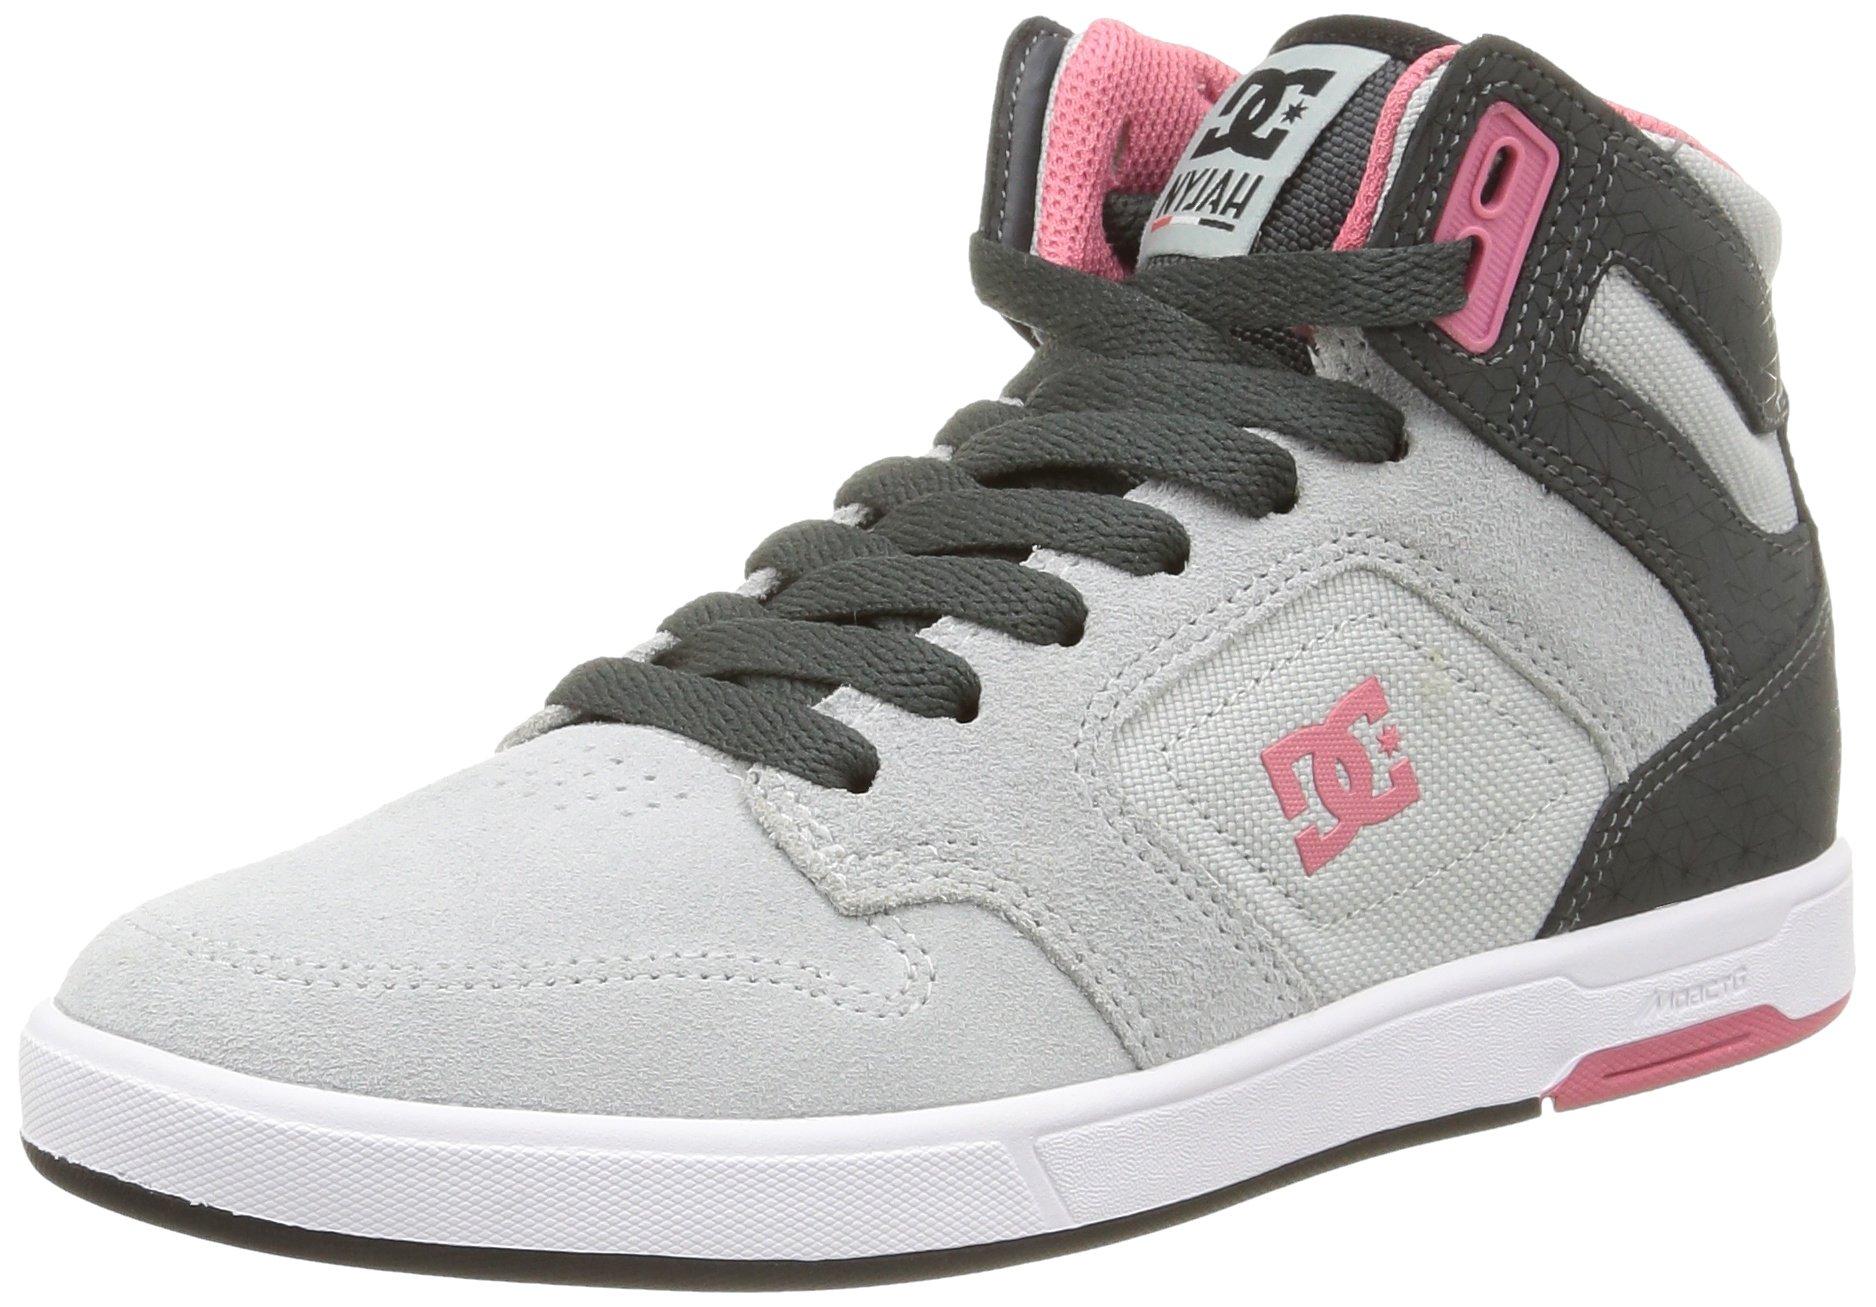 Se Hautes Shoes FemmeGrisgrey Nyjah High Sneakers black36 Dc Eu vym8n0wNO